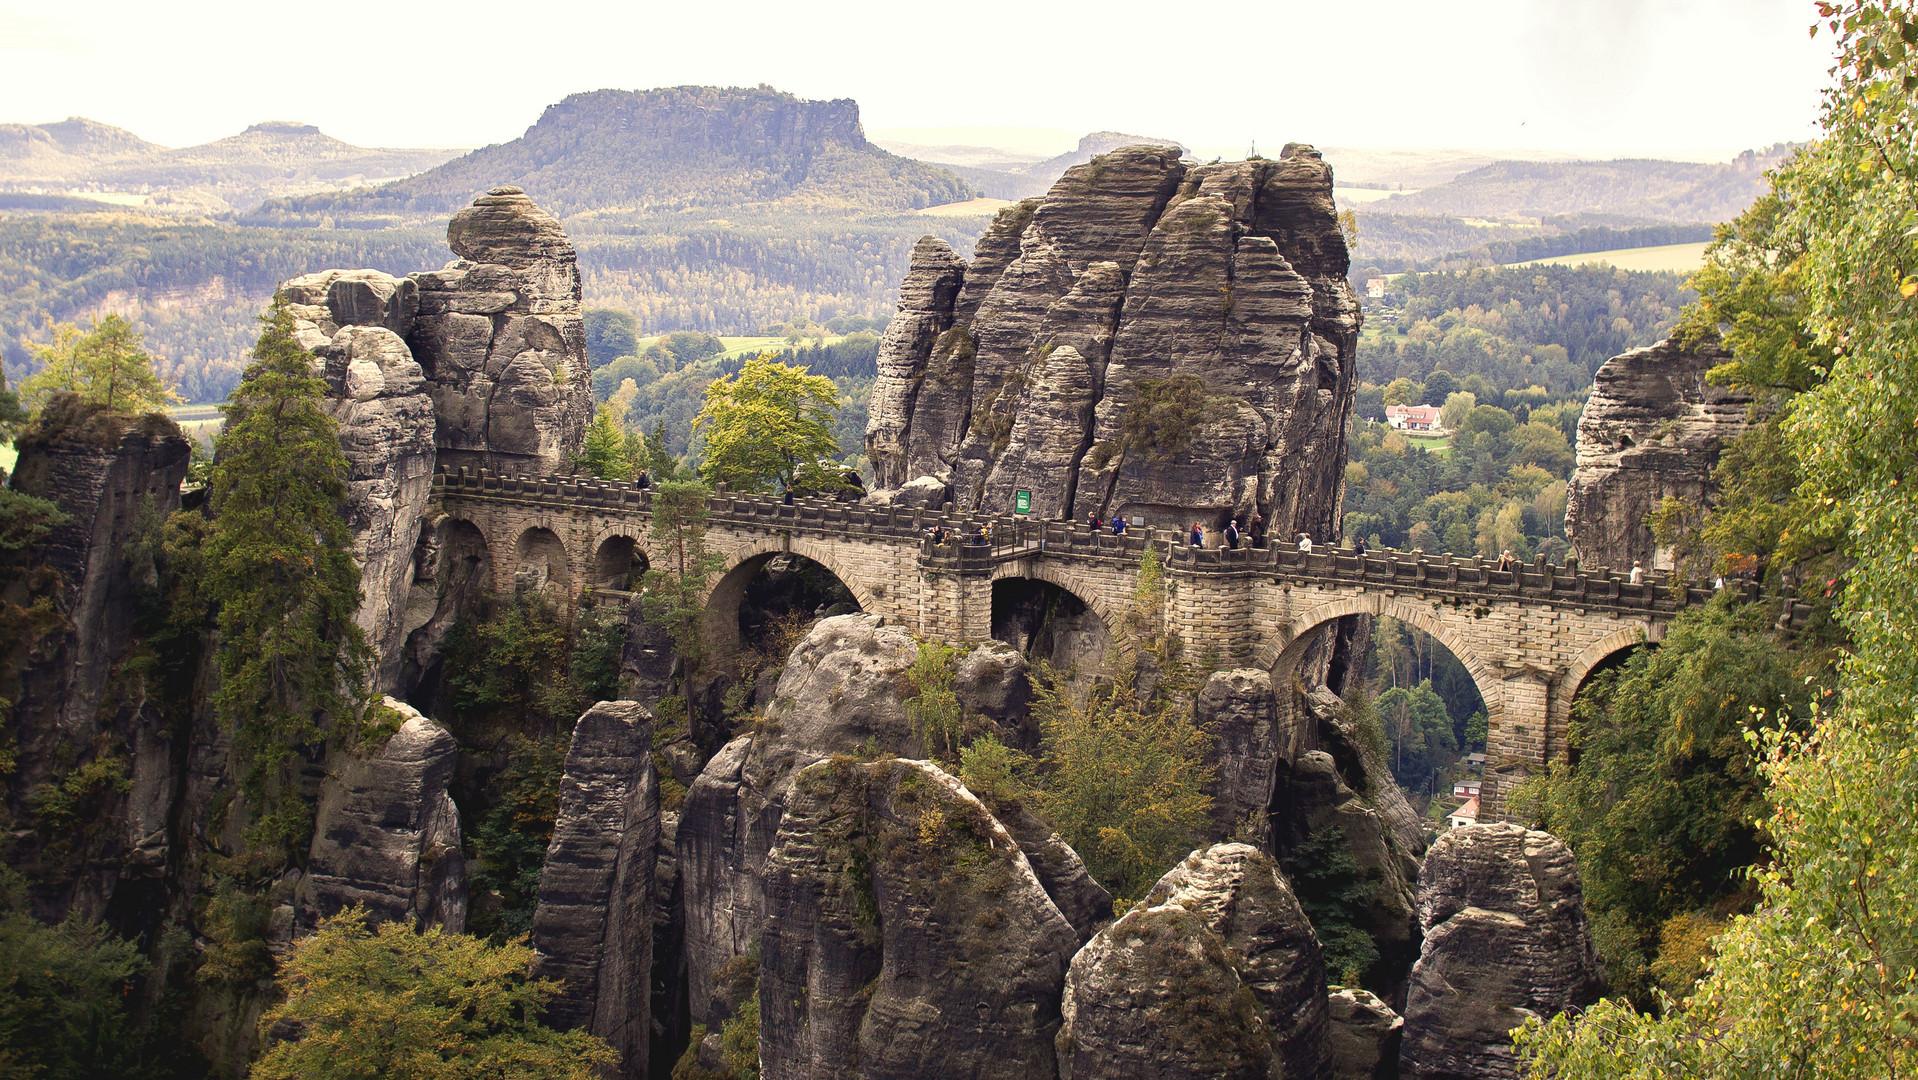 Basteienbrücke